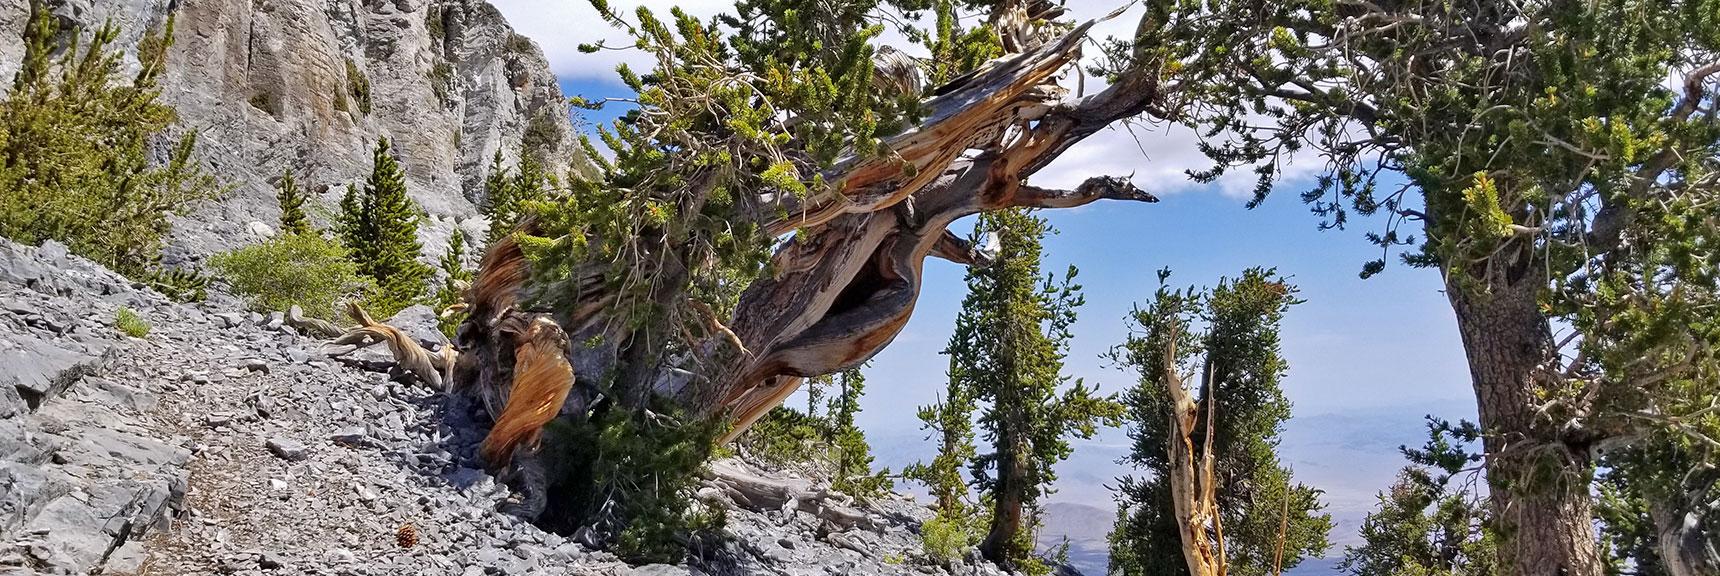 Bristlecone Pines Arising from Granite Rock of Mummy's Knees | Mummy Mountain's Knees | Mt. Charleston Wilderness, Nevada 023